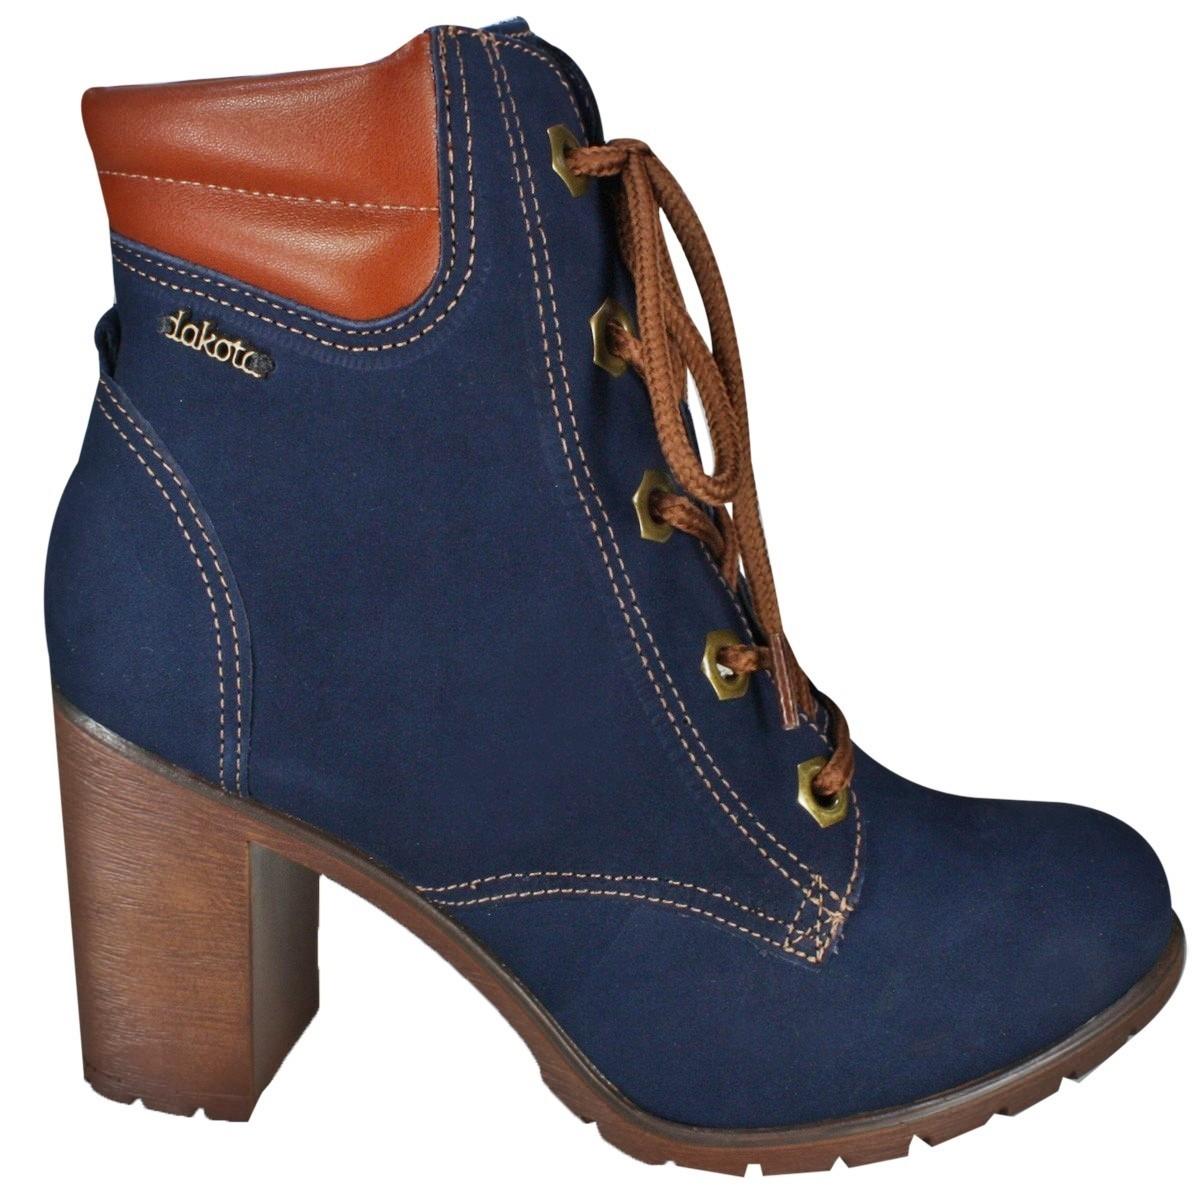 6022671a7 Bizz Store - Bota Feminina Ankle Boot Dakota Salto Alto Coturno